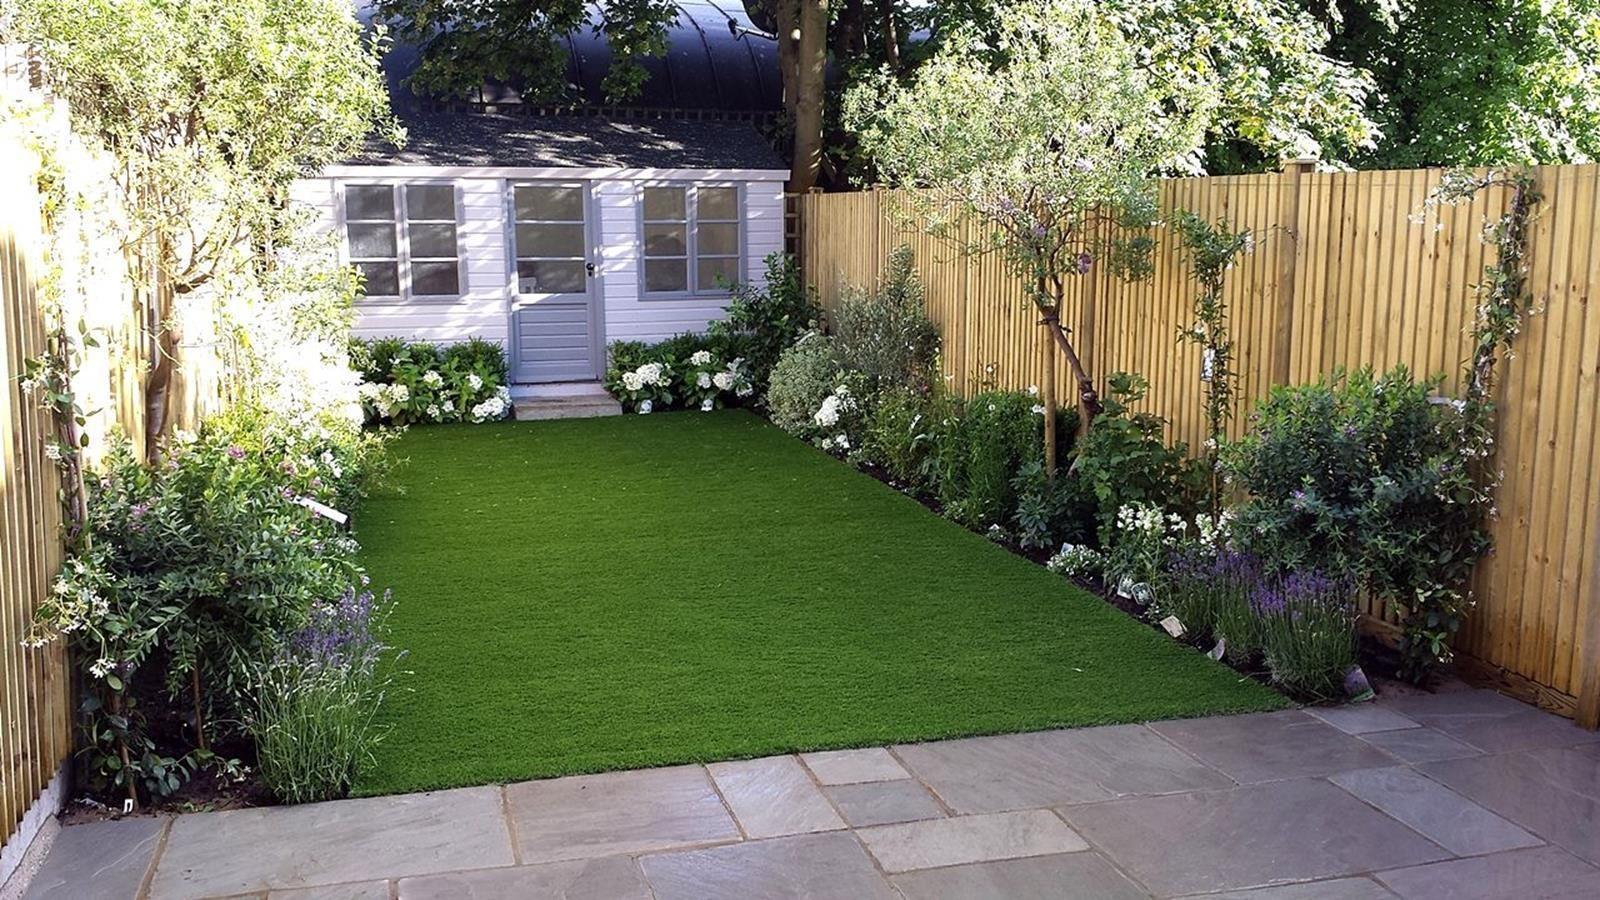 44 Stunning Low Budget Back Yard Landscaping Ideas Let S Diy Home Low Maintenance Garden Design Small Garden Design Ideas Low Maintenance Simple Garden Designs